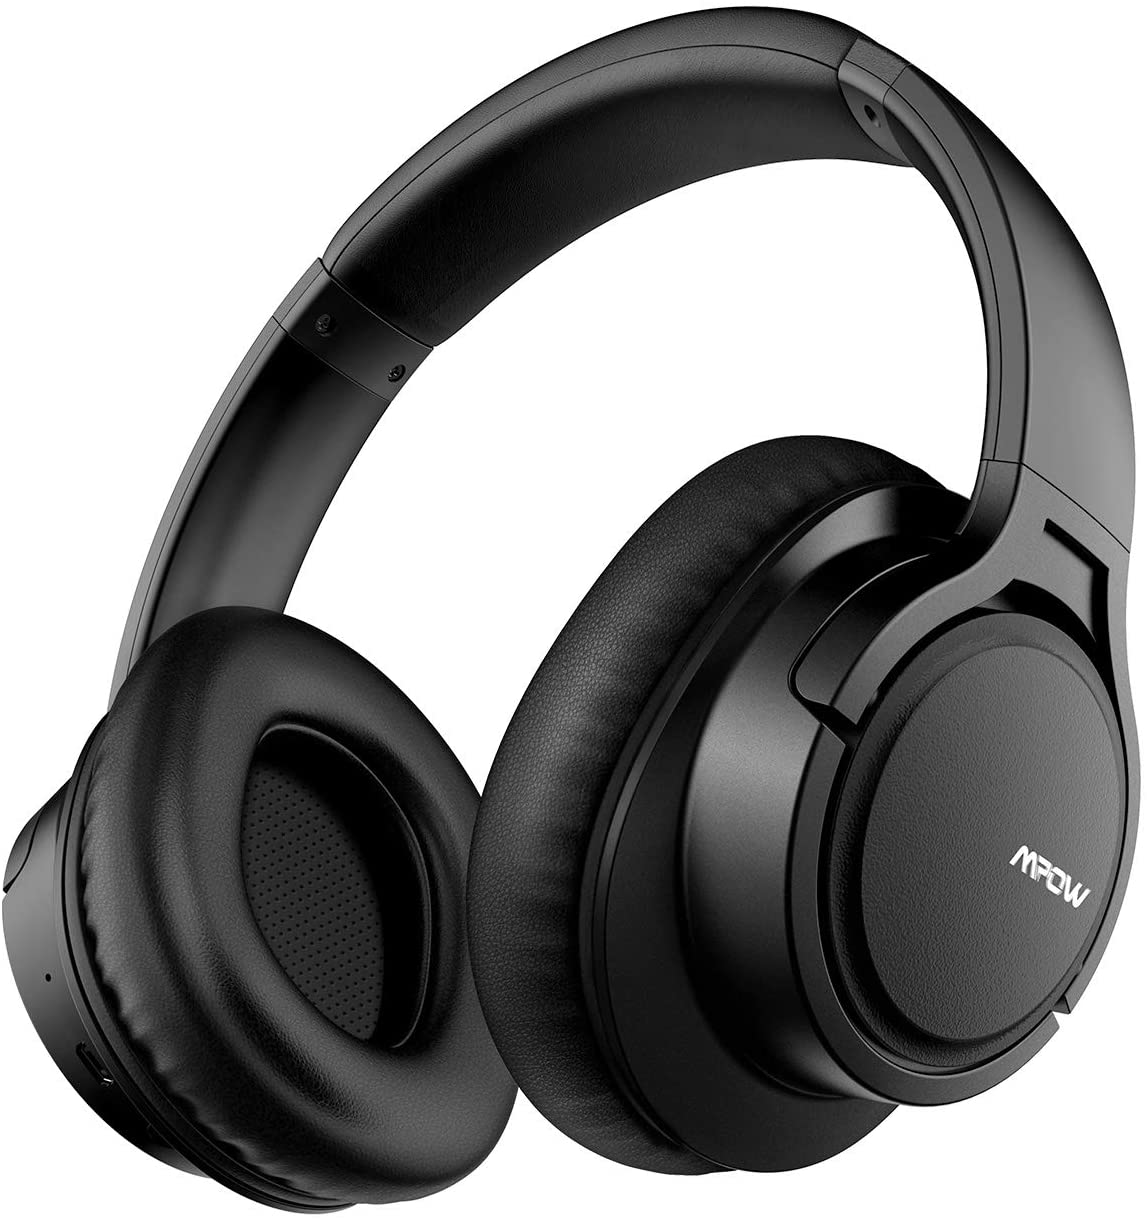 Mpow H7 Cascos Bluetooth Diadema, Auriculares Diadema Bluetooth, 25 Hrs de Reproducir, Cascos Bluetooth Inalámbricos con Micrófono CVC6.0, Auriculares Bluetooth Diadema para TV, Móvil, PC-Negro